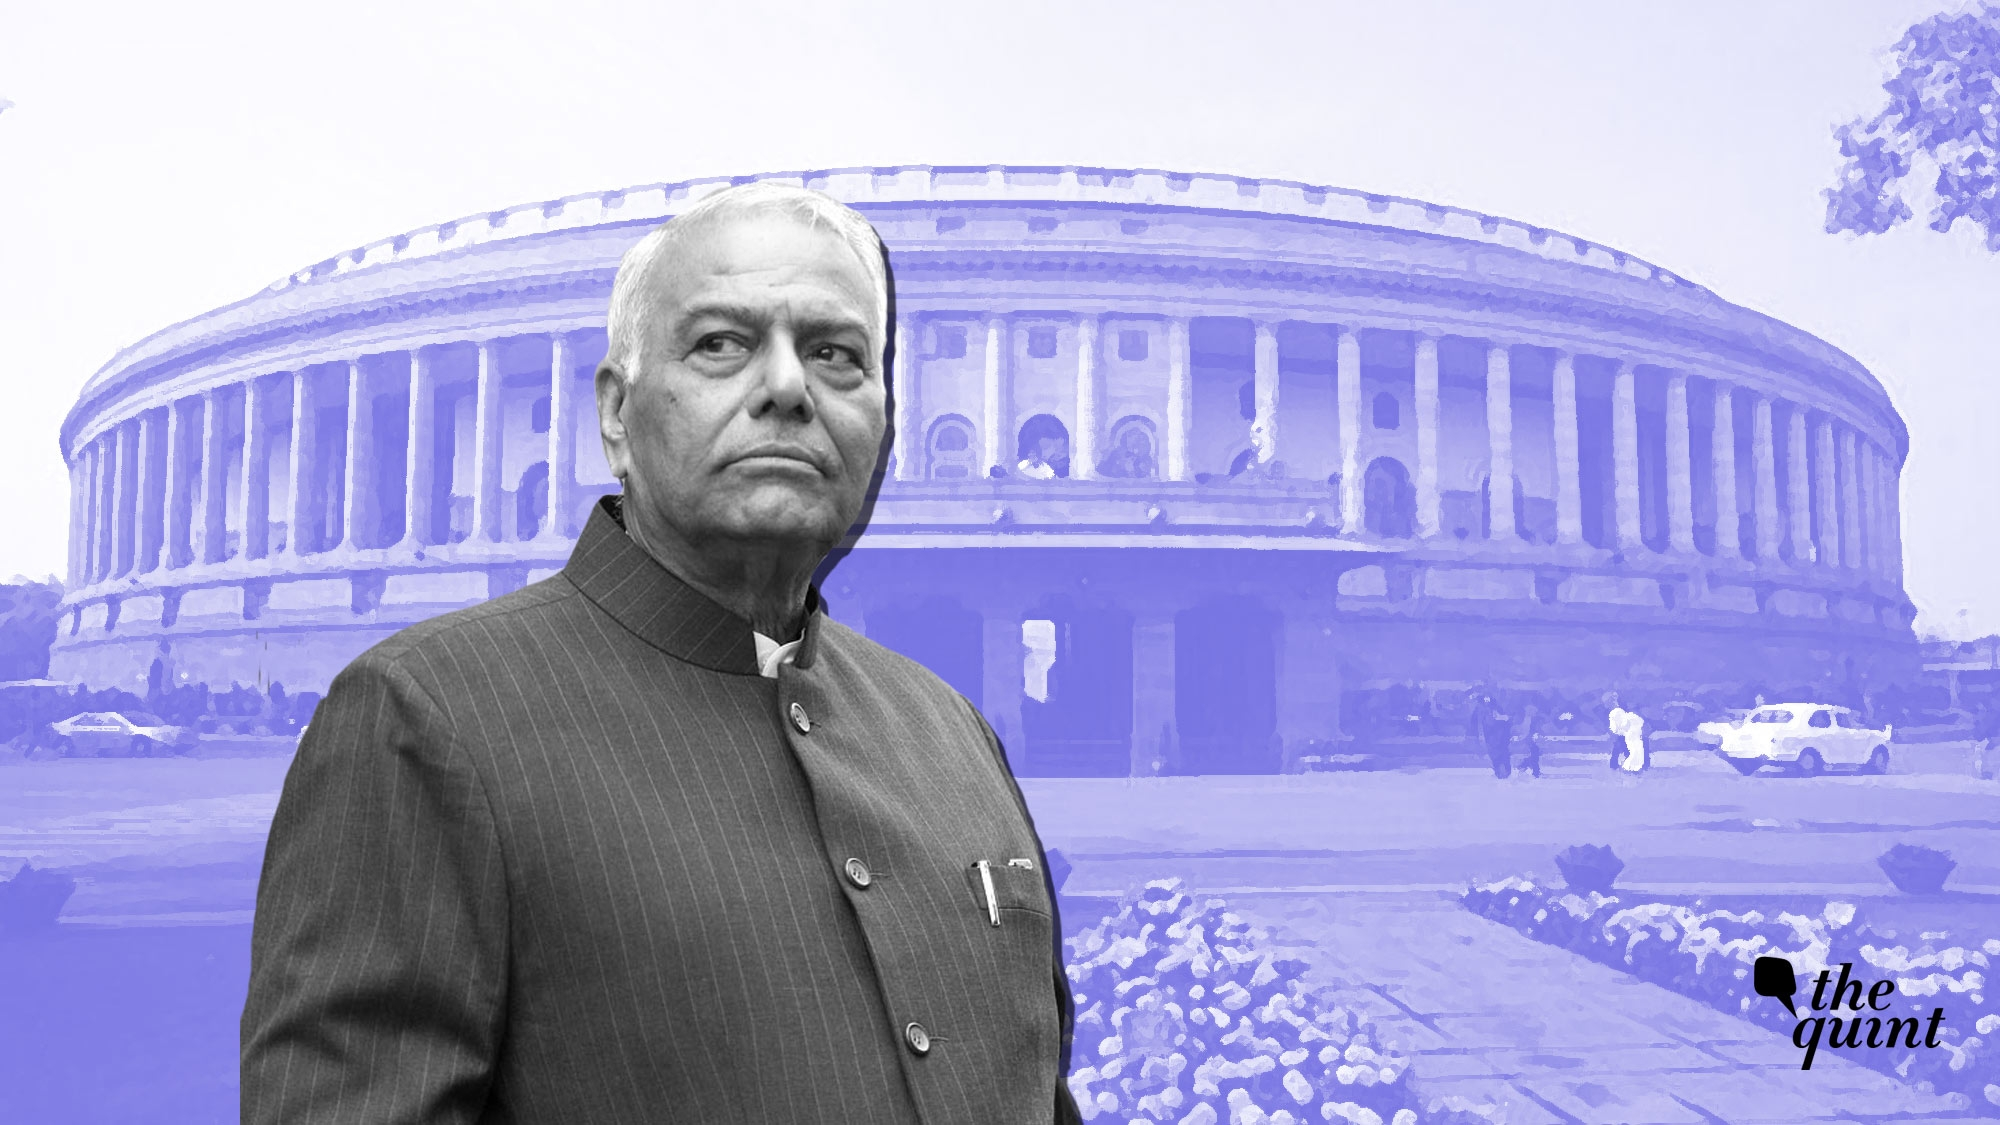 Flipboard: Chandrababu Naidu promises doles and Scheduled